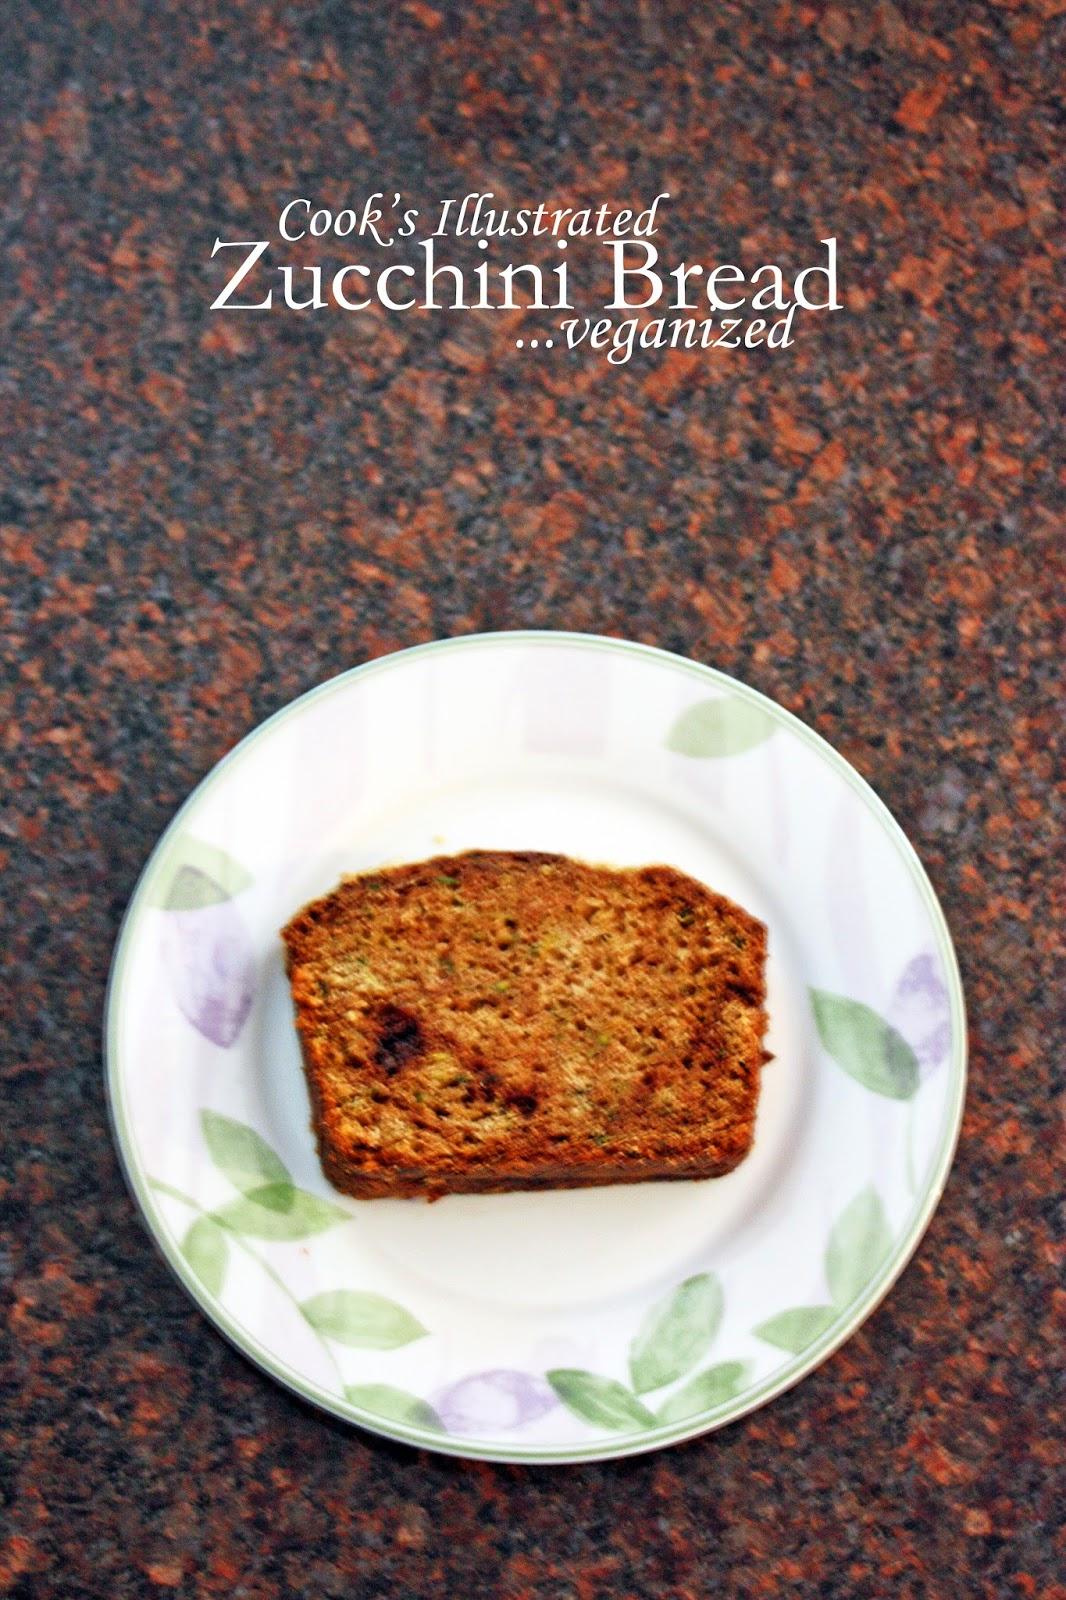 cook's illustrated zucchini bread vegan